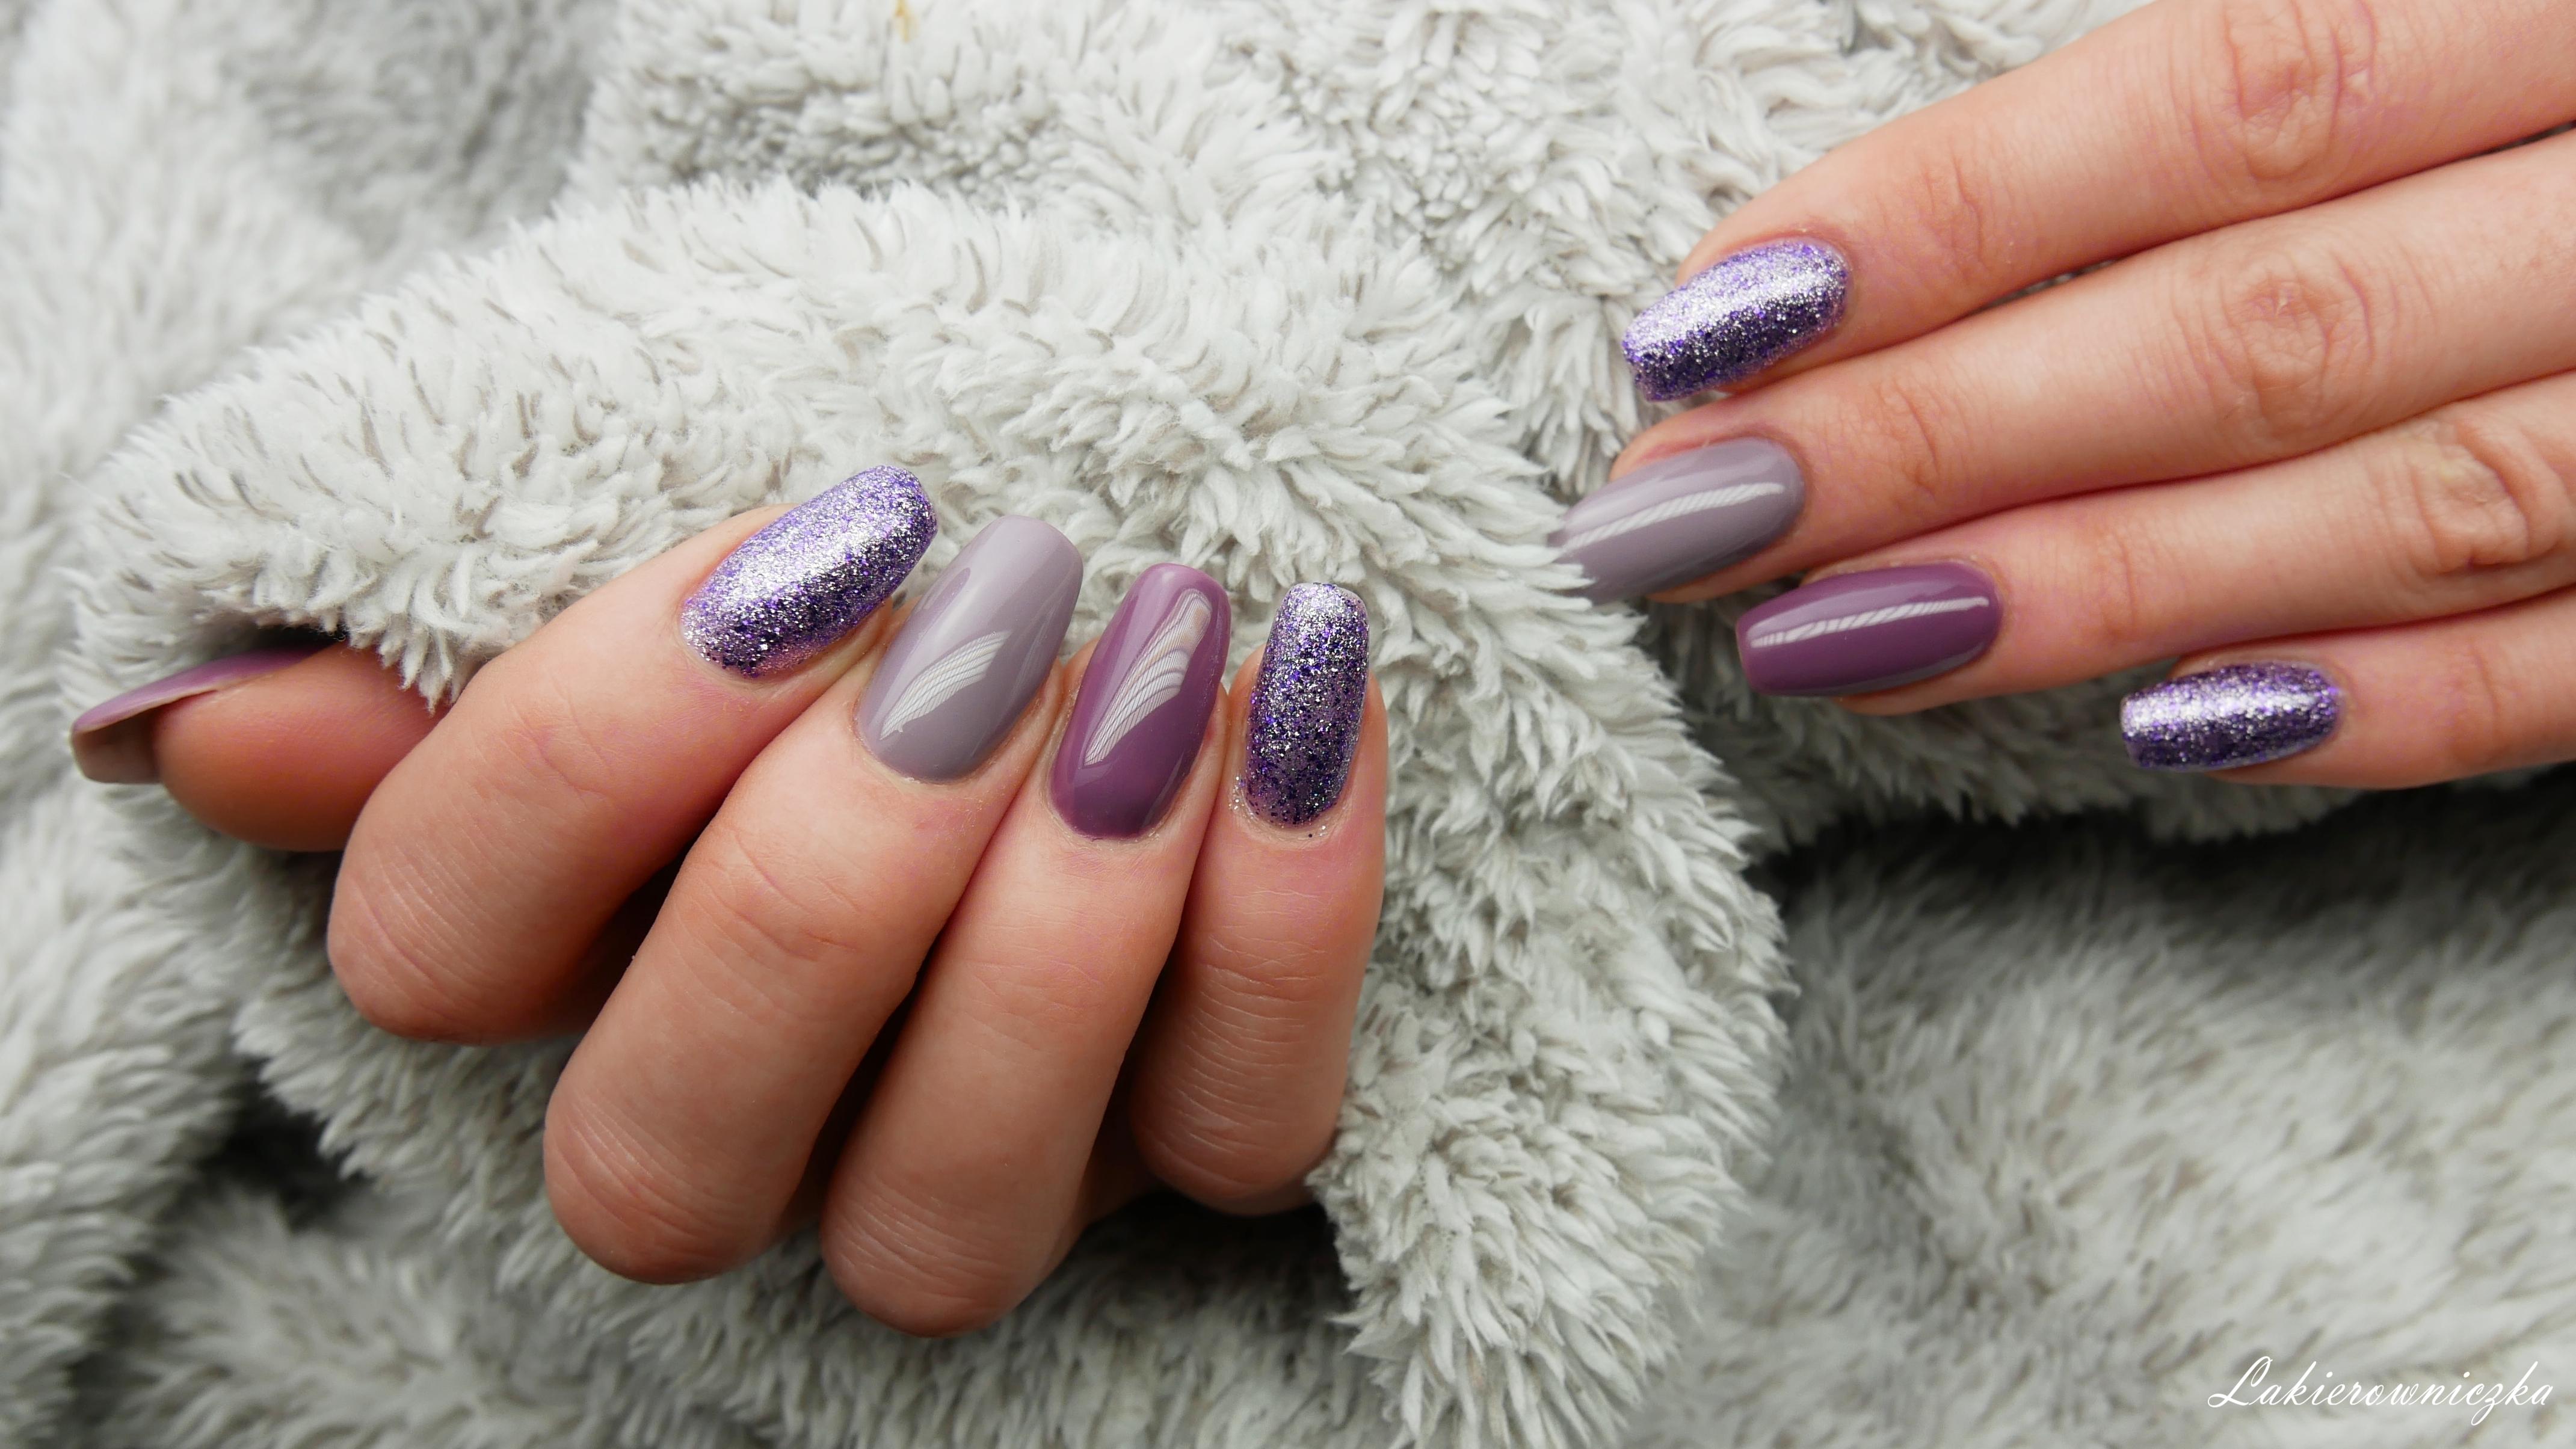 fioletowe-hybrydy-paznokcie-hybrydowe-pinails-245-ncla-brentwood-wives-hihybrid-403-light-nude-Lakierowniczka